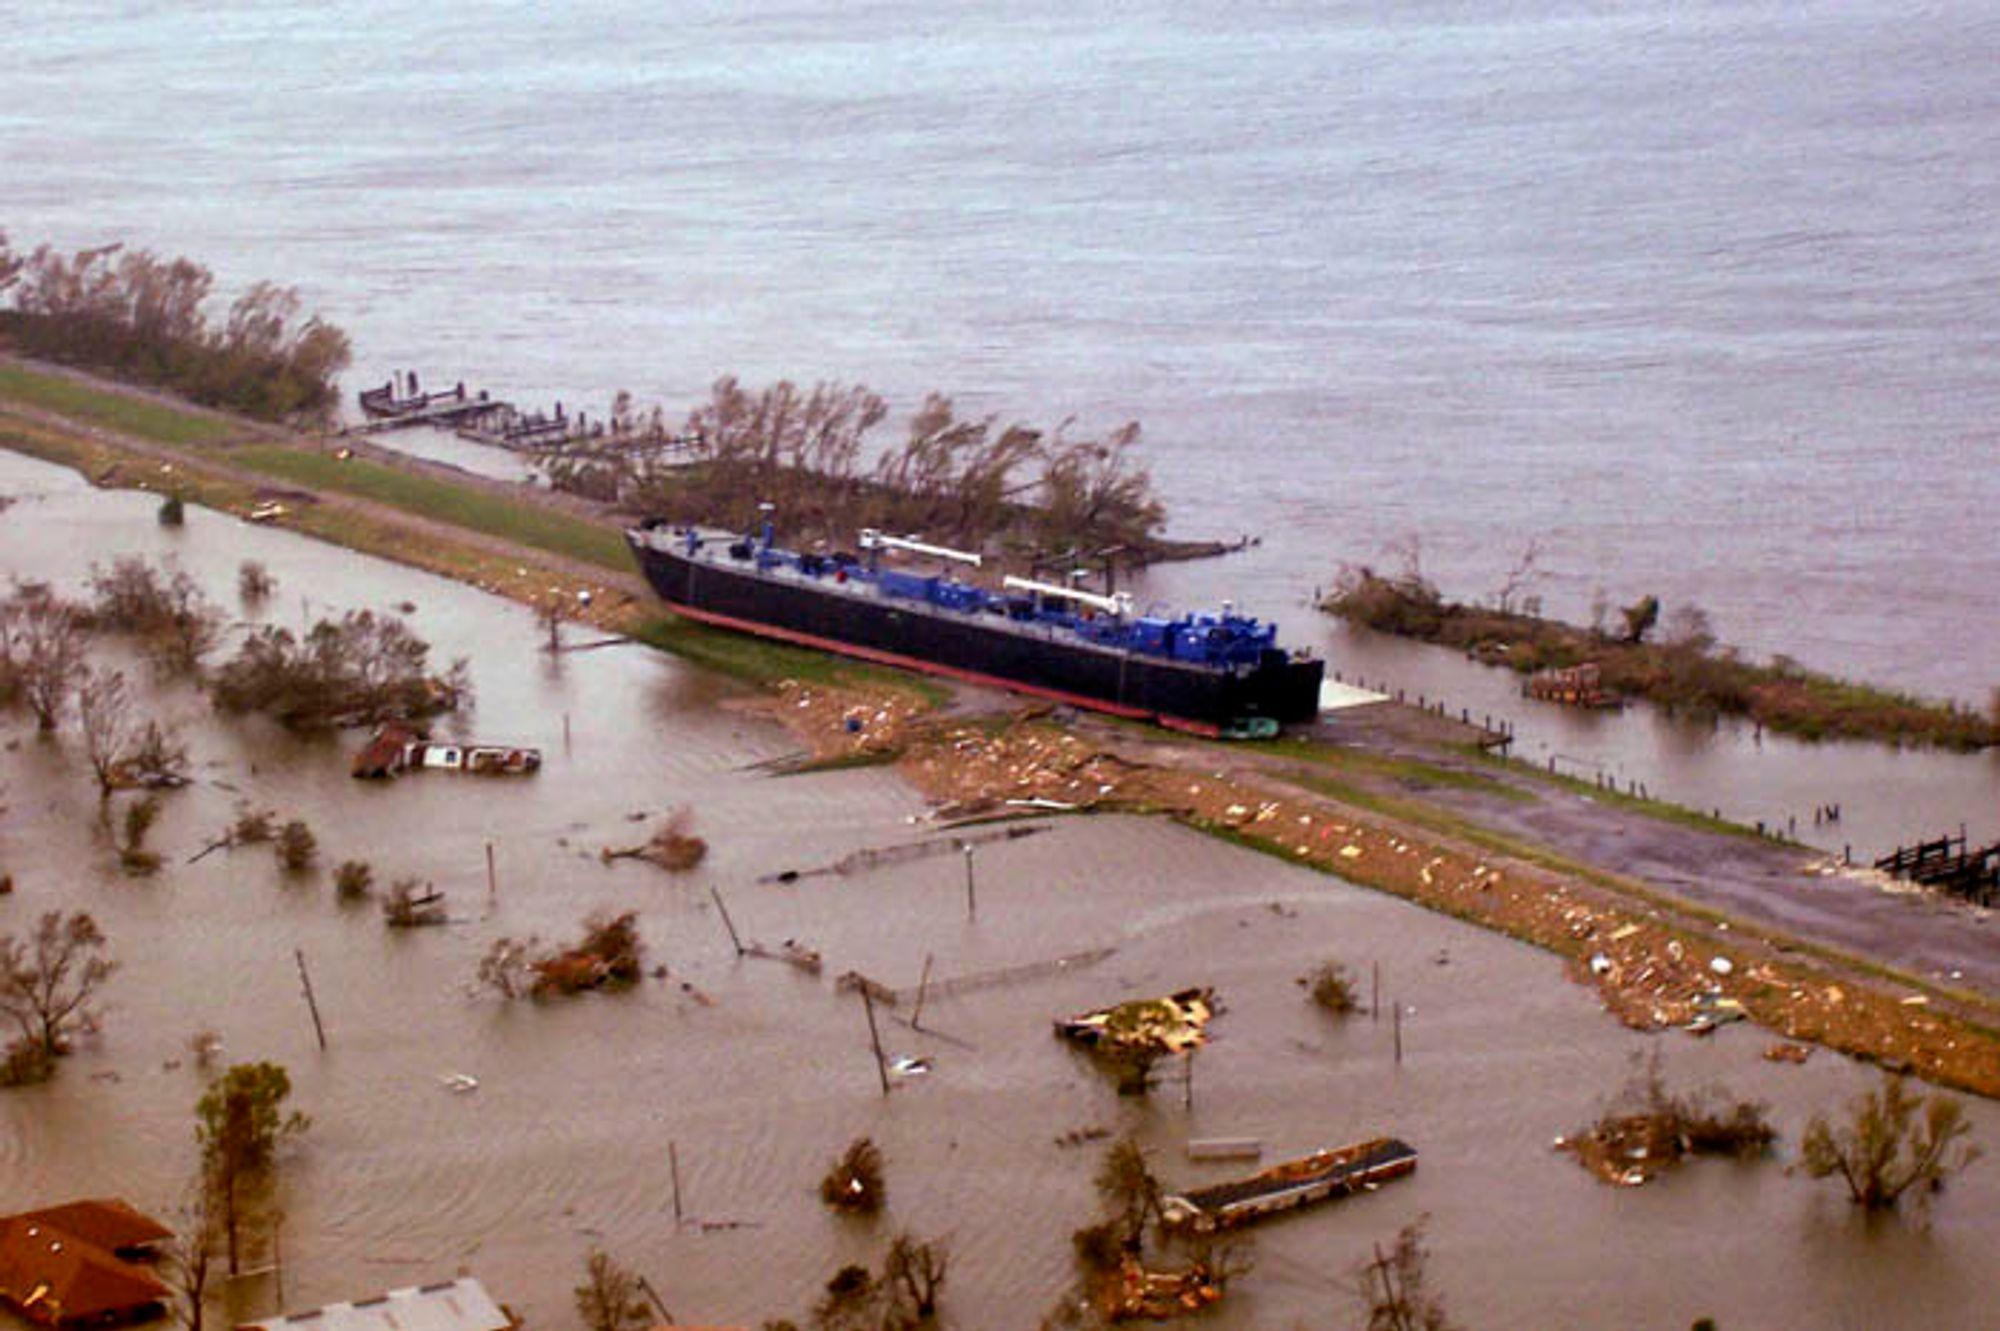 Katrina traff her kysten 29. august ved Plaquemines Parish, like ved Empire, Buras og Boothville i Lousiana.